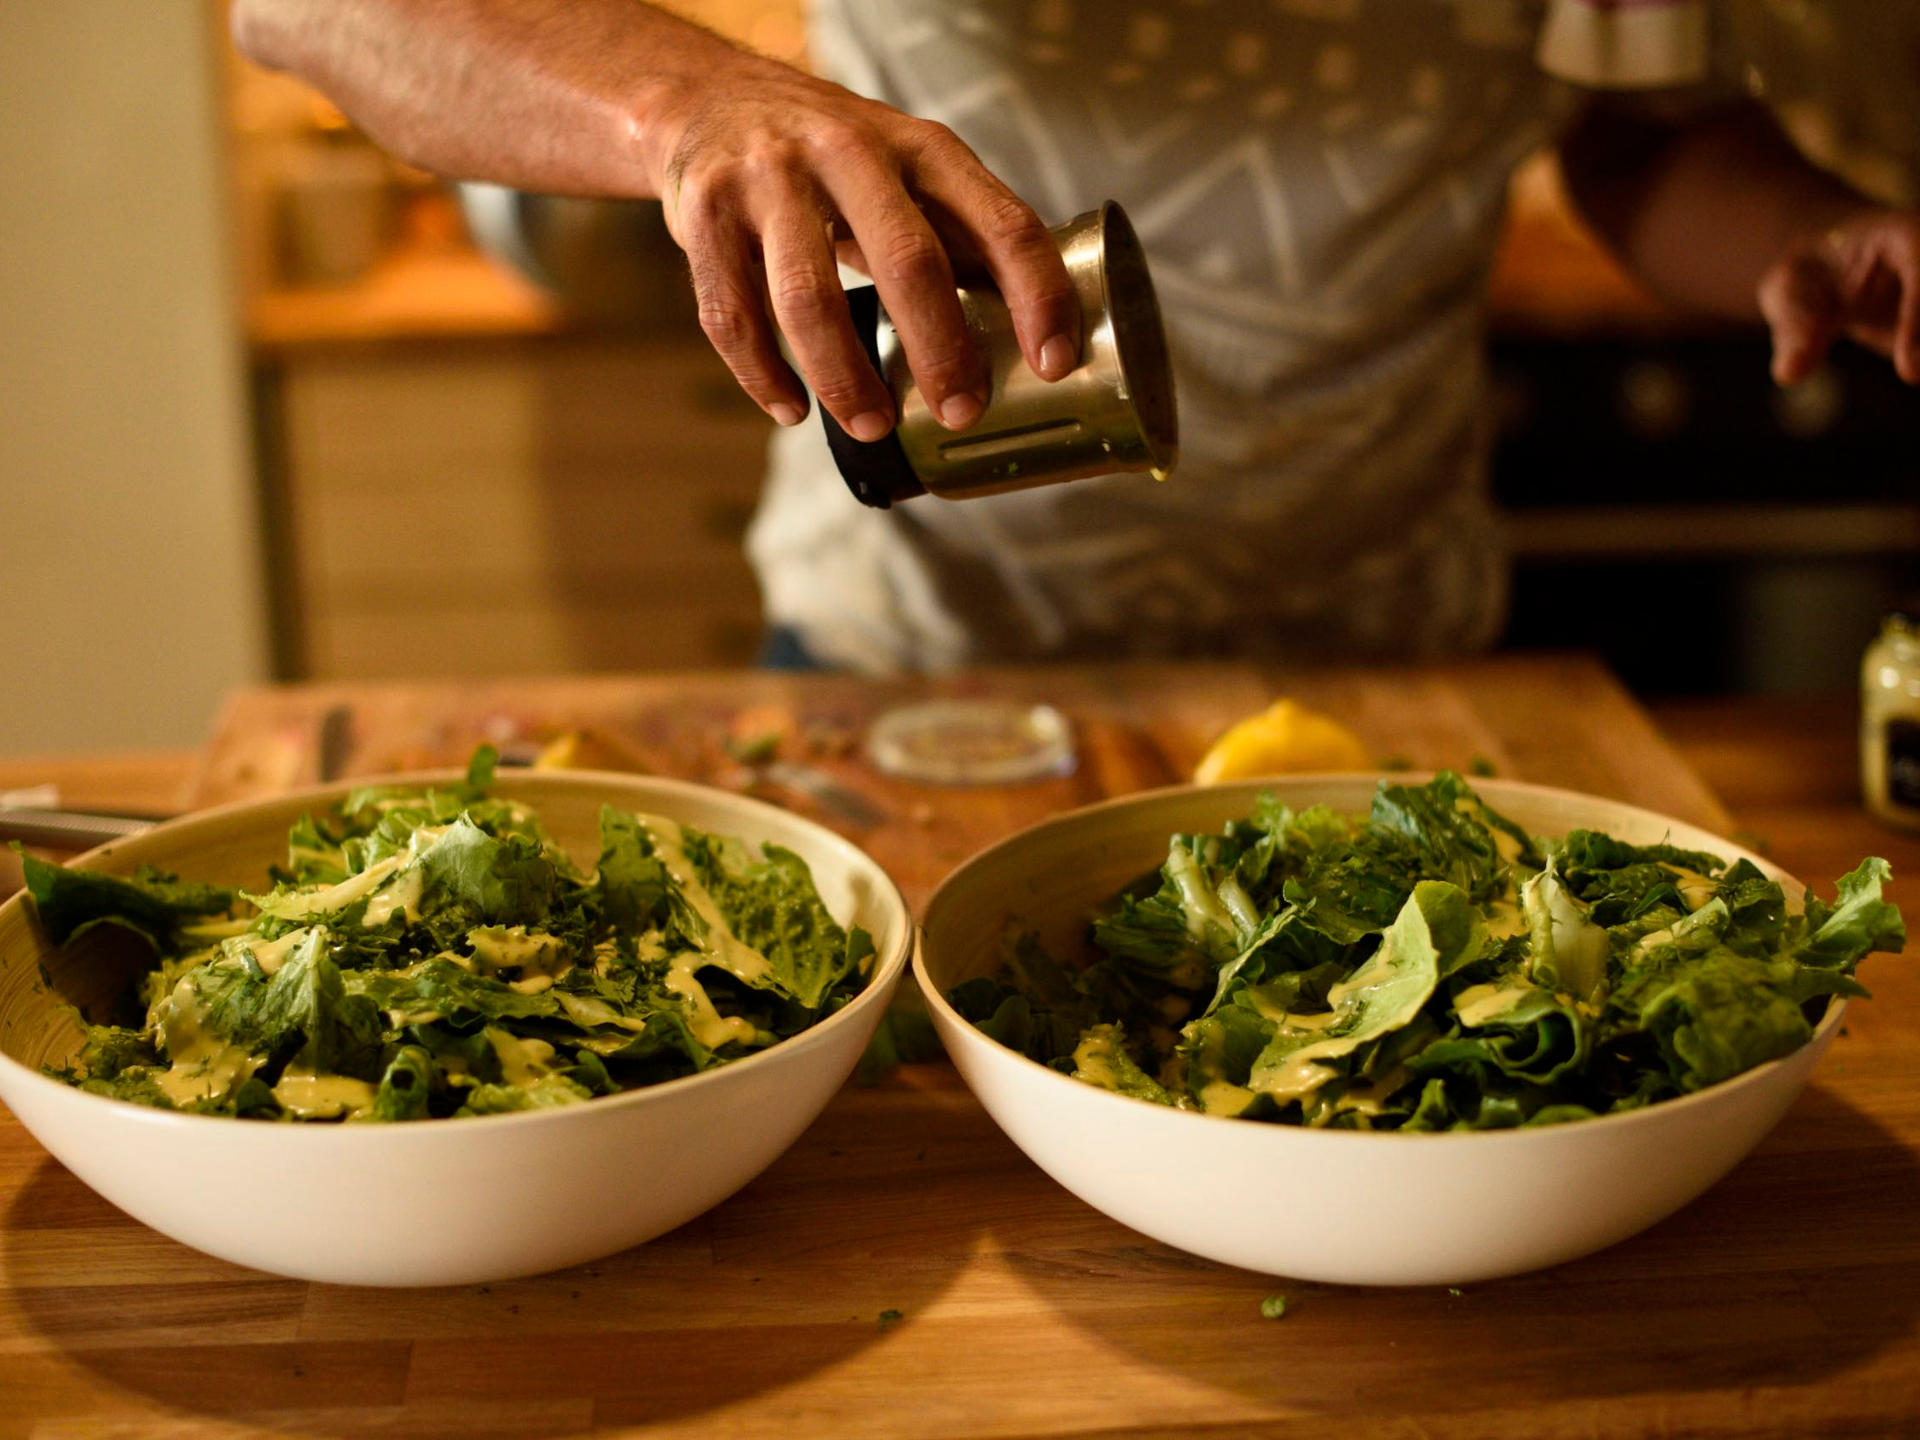 oktoyogashalaretreat_Food_preparation02.